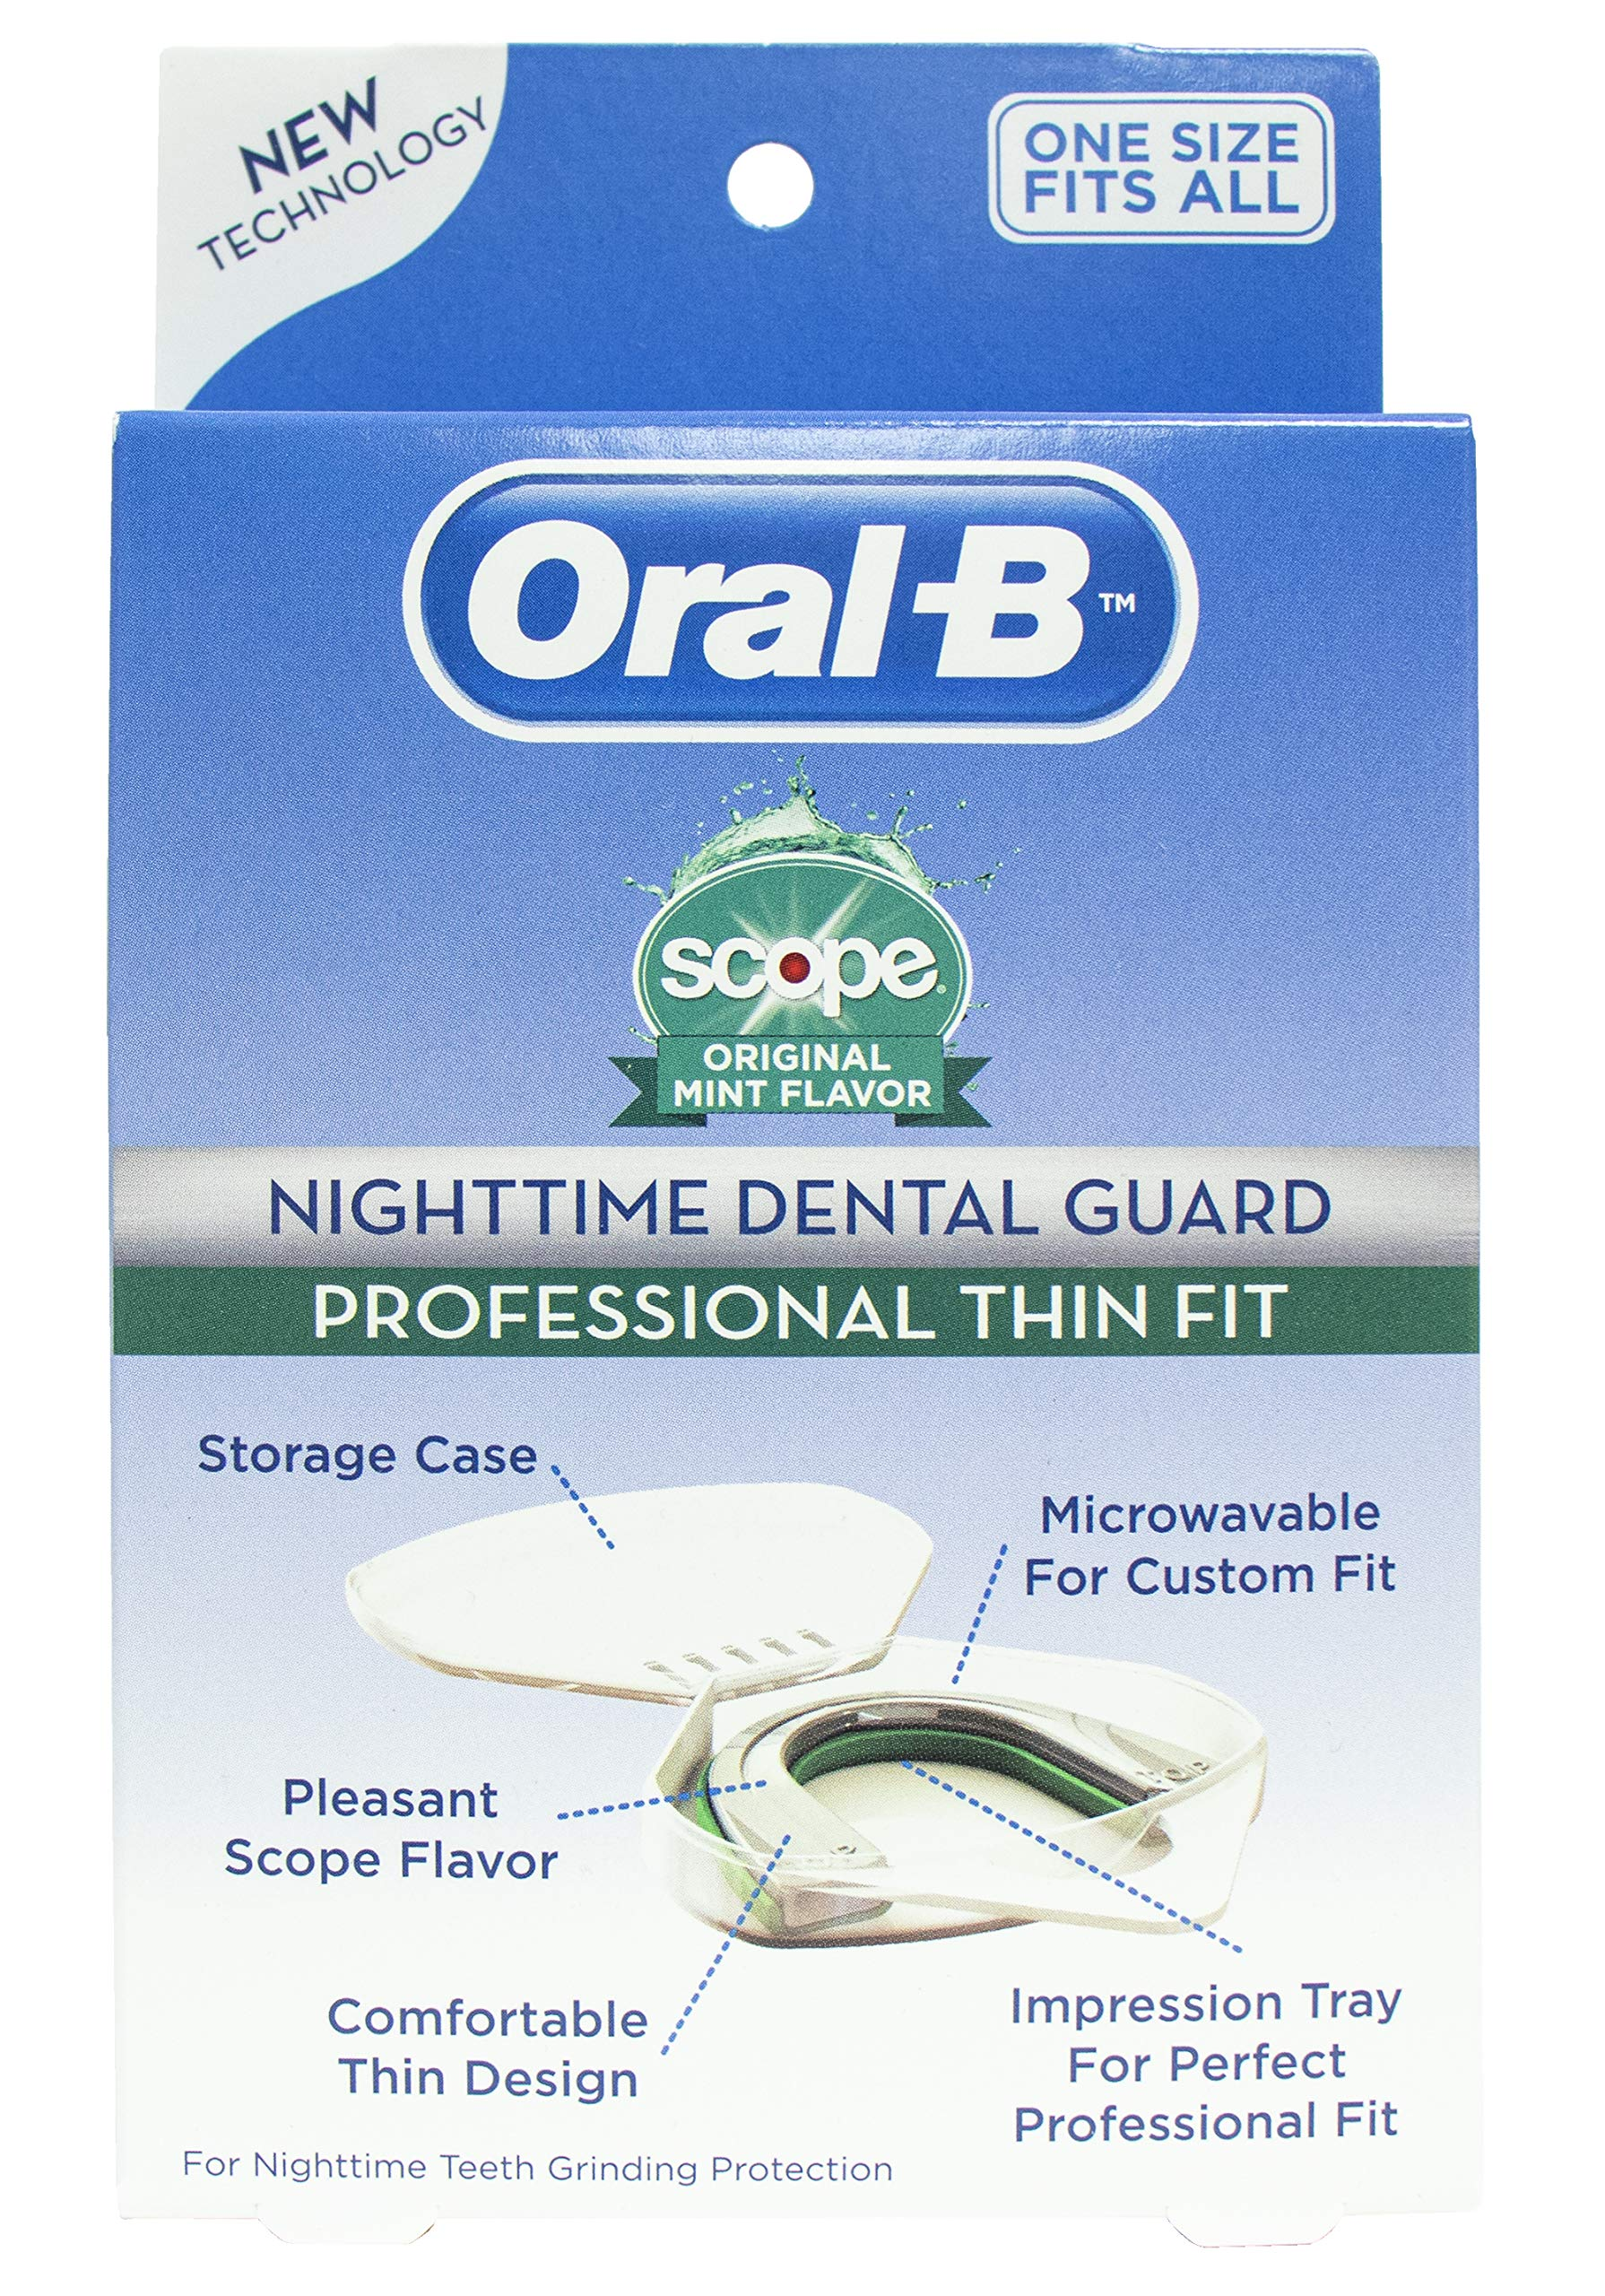 Oral B Nighttime Dental Scope Professional